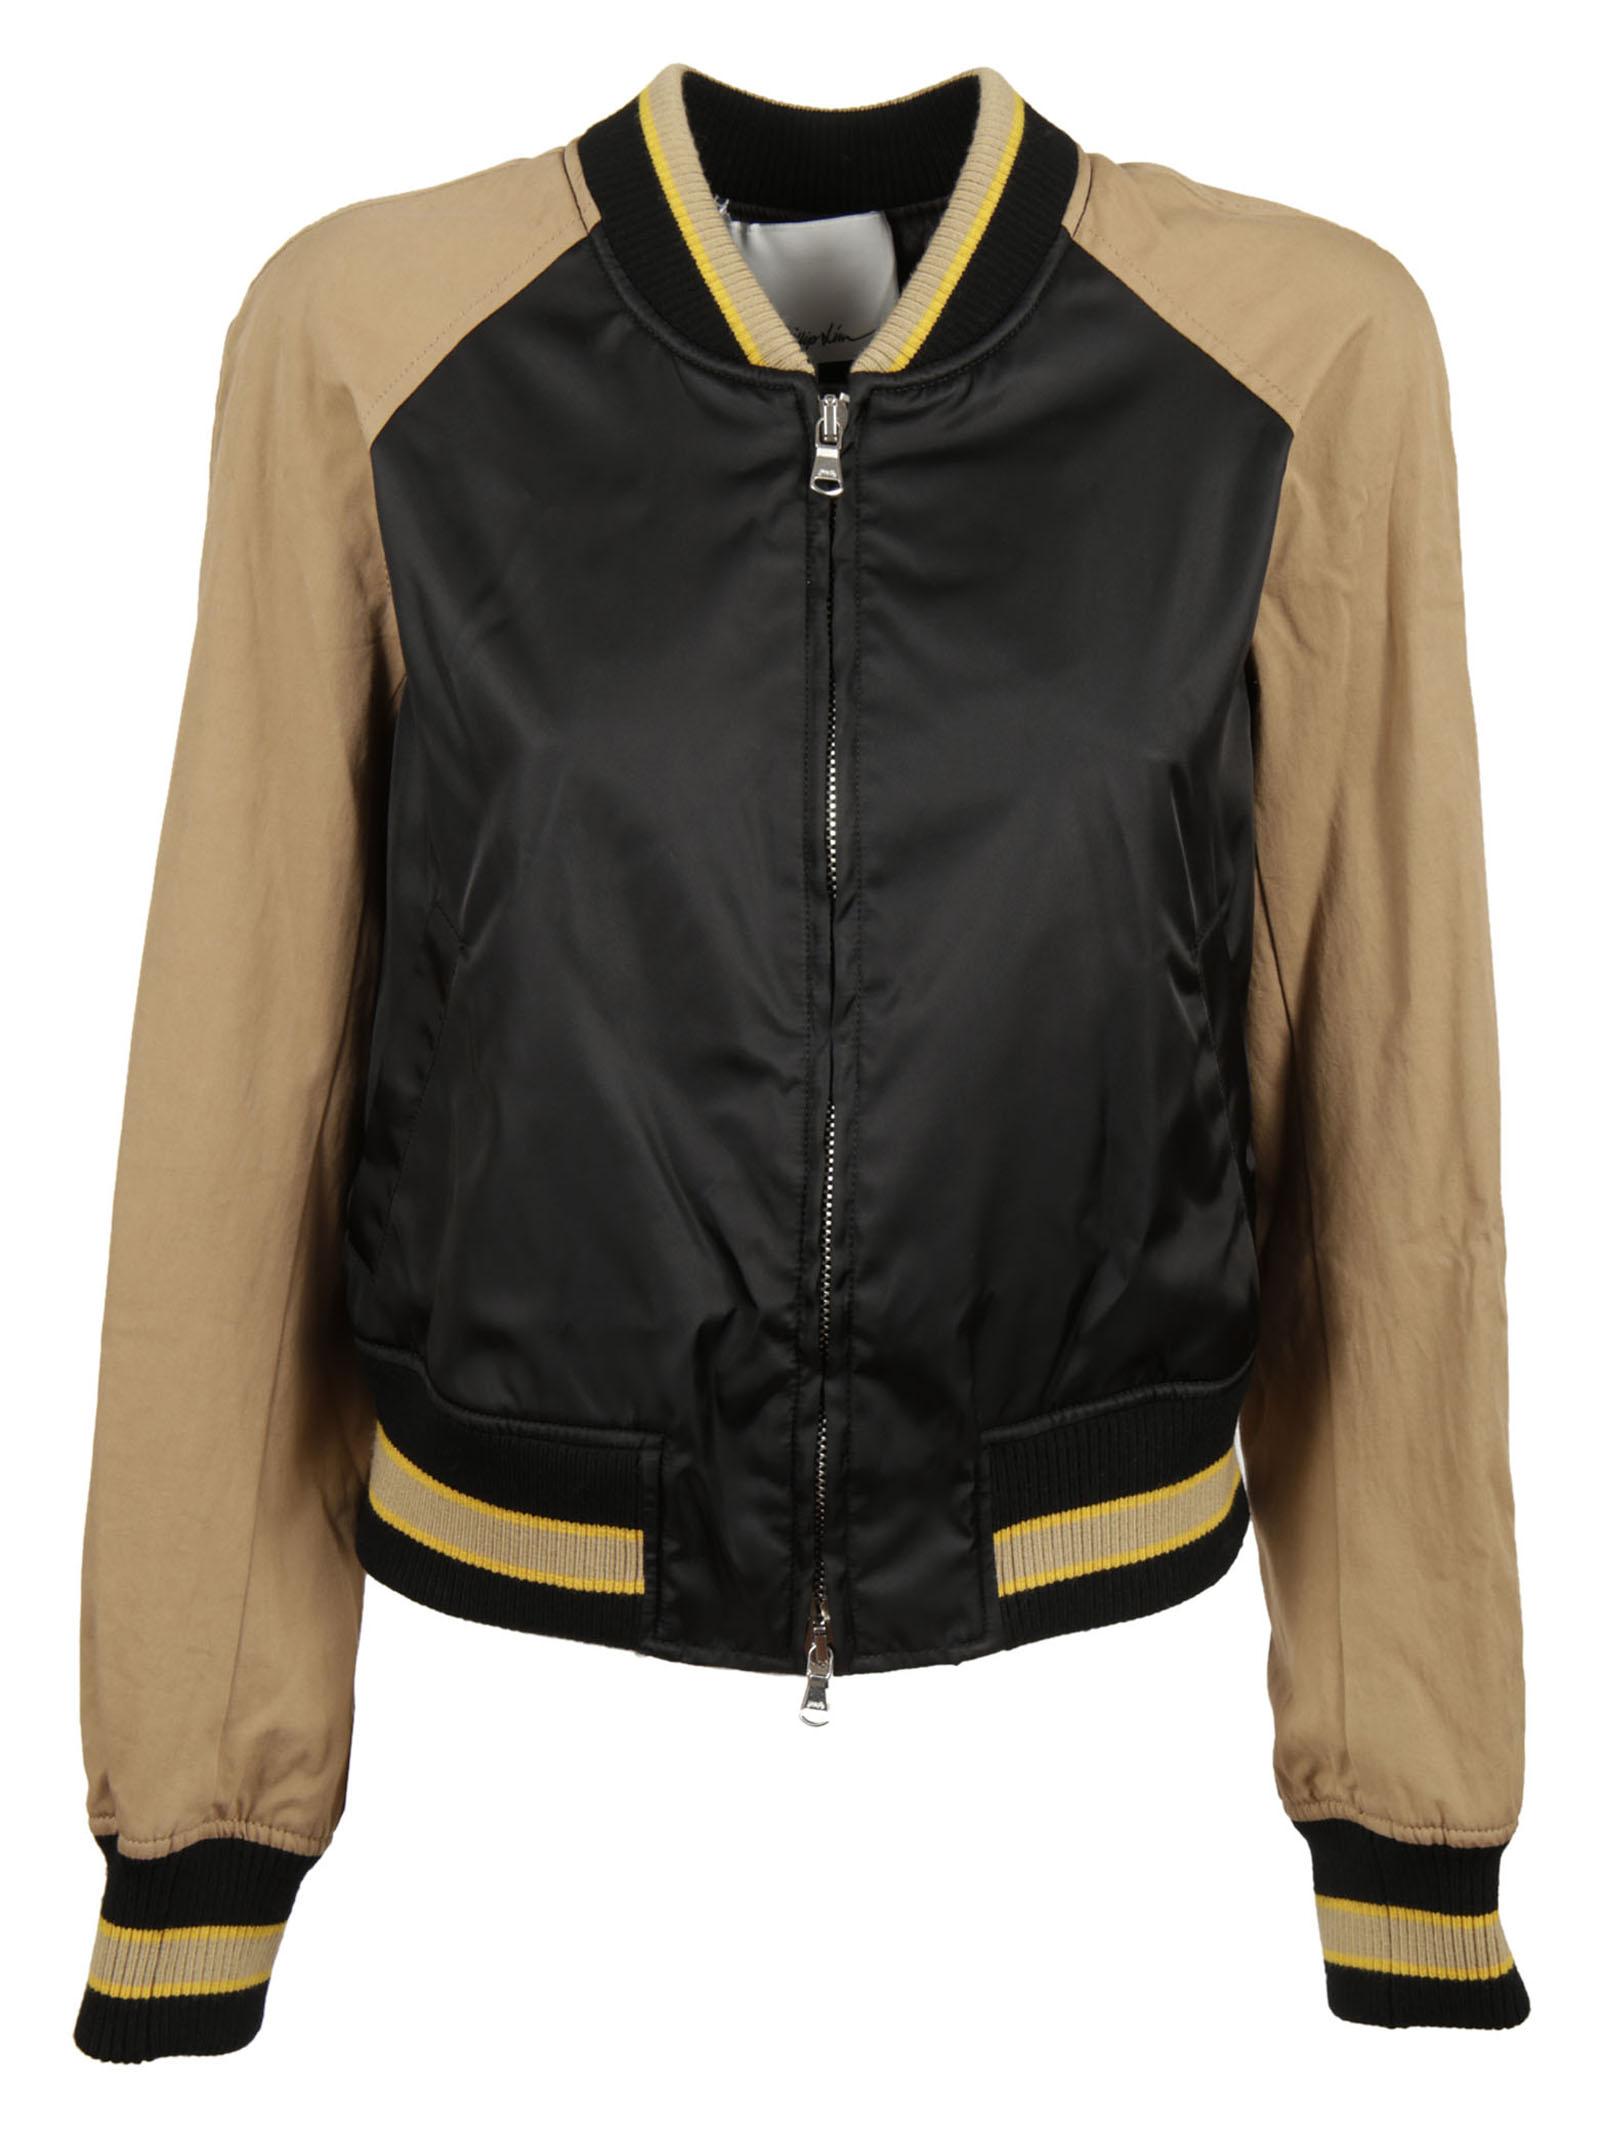 3.1 Phillip Lim 3.1 Phillip Lim Polyamide Jacket